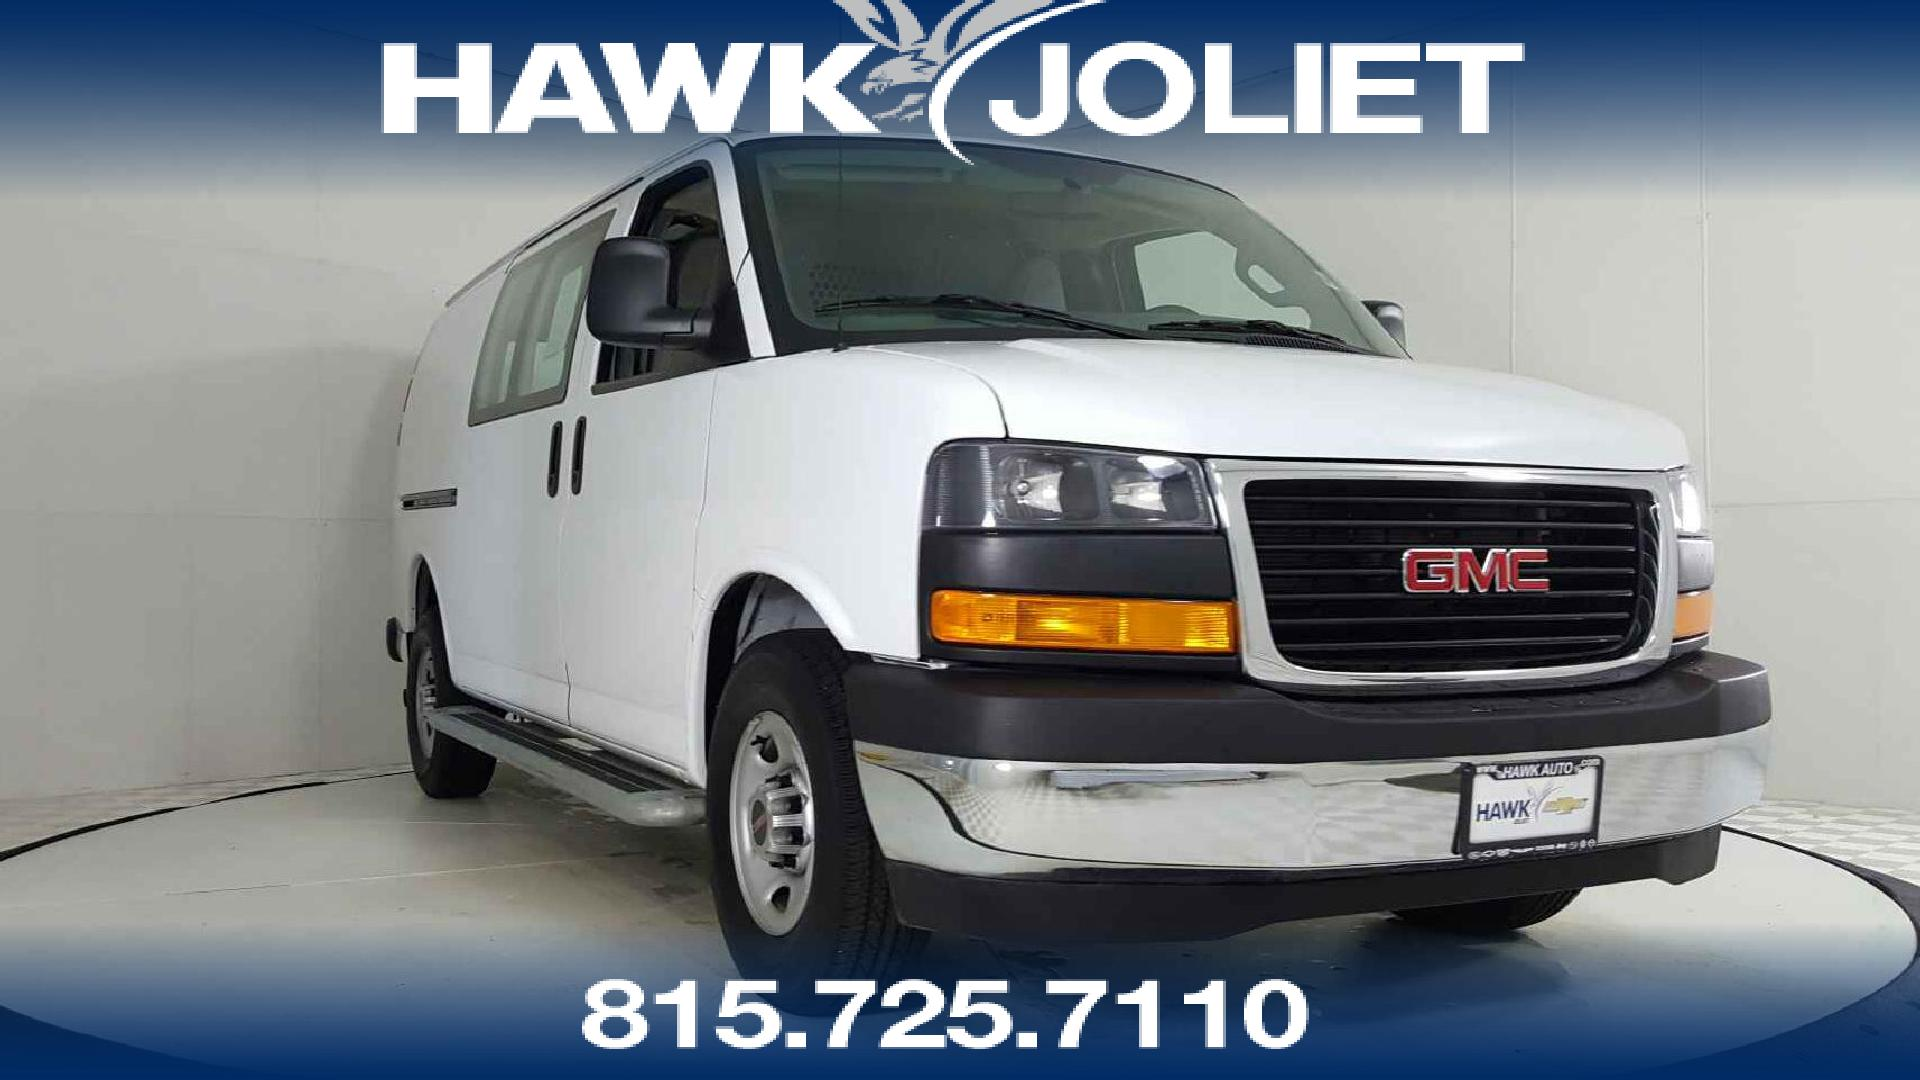 Joliet Used 2017 Gmc Savana Cargo Van Vehicles For Sale Vehicle Photo In Il 60435